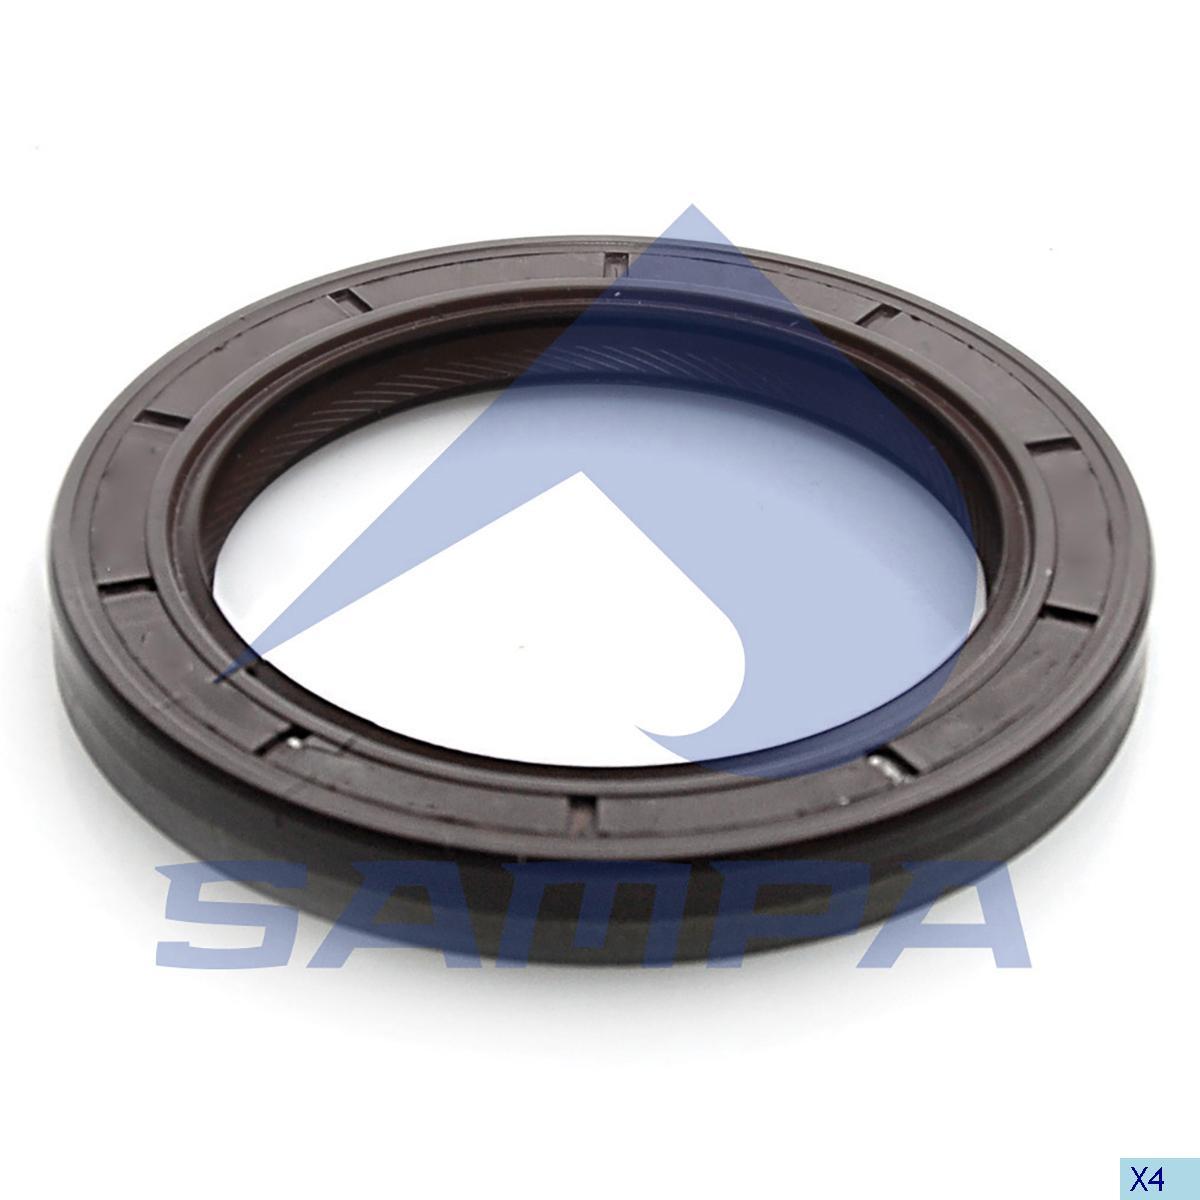 Seal Ring, Clutch Housing, Volvo, Clutch